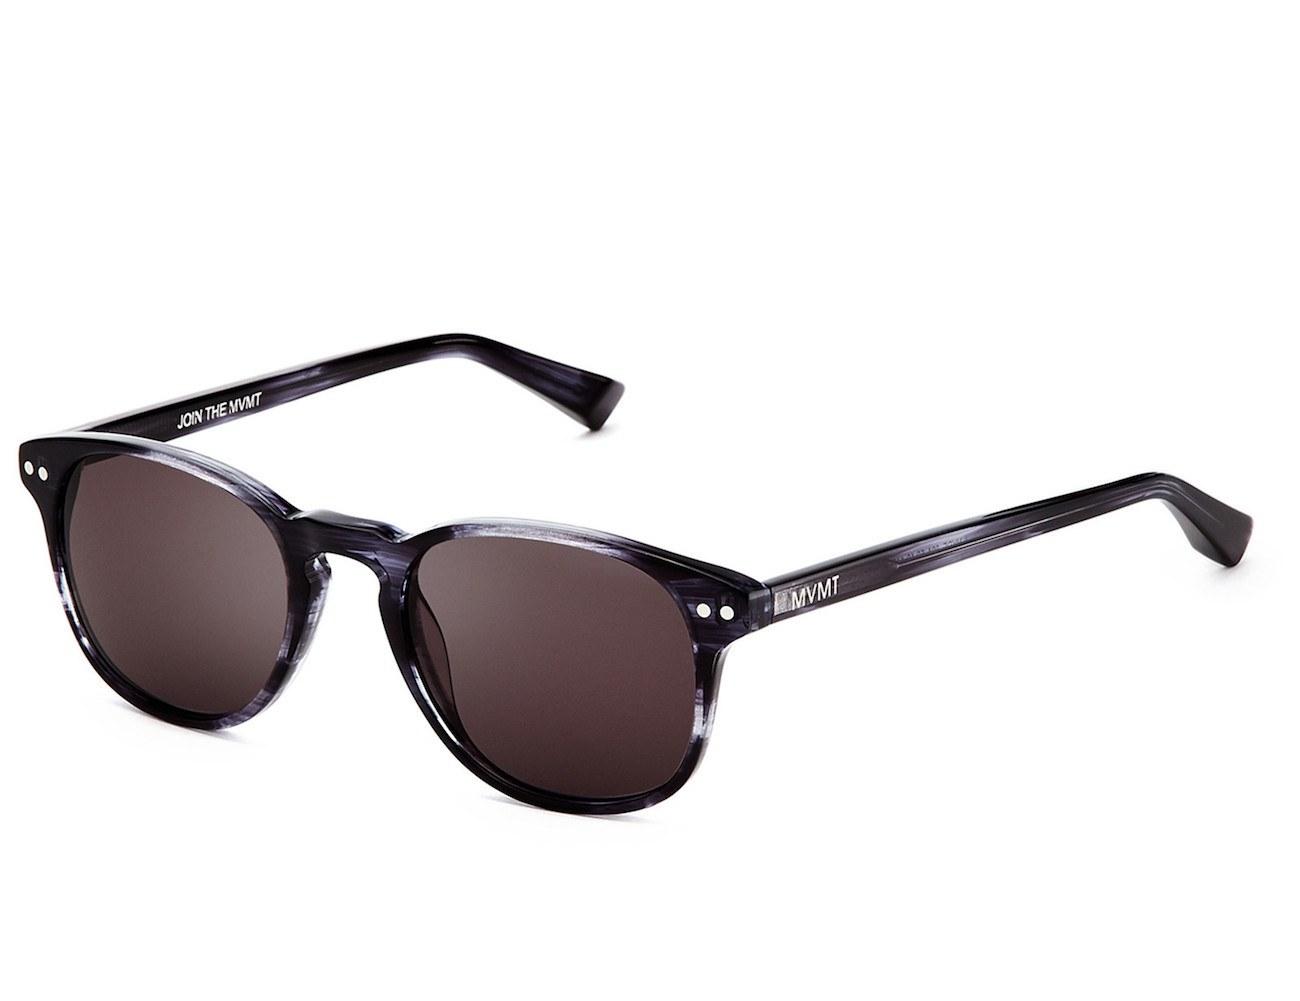 HYDE Sunglasses by MVMT